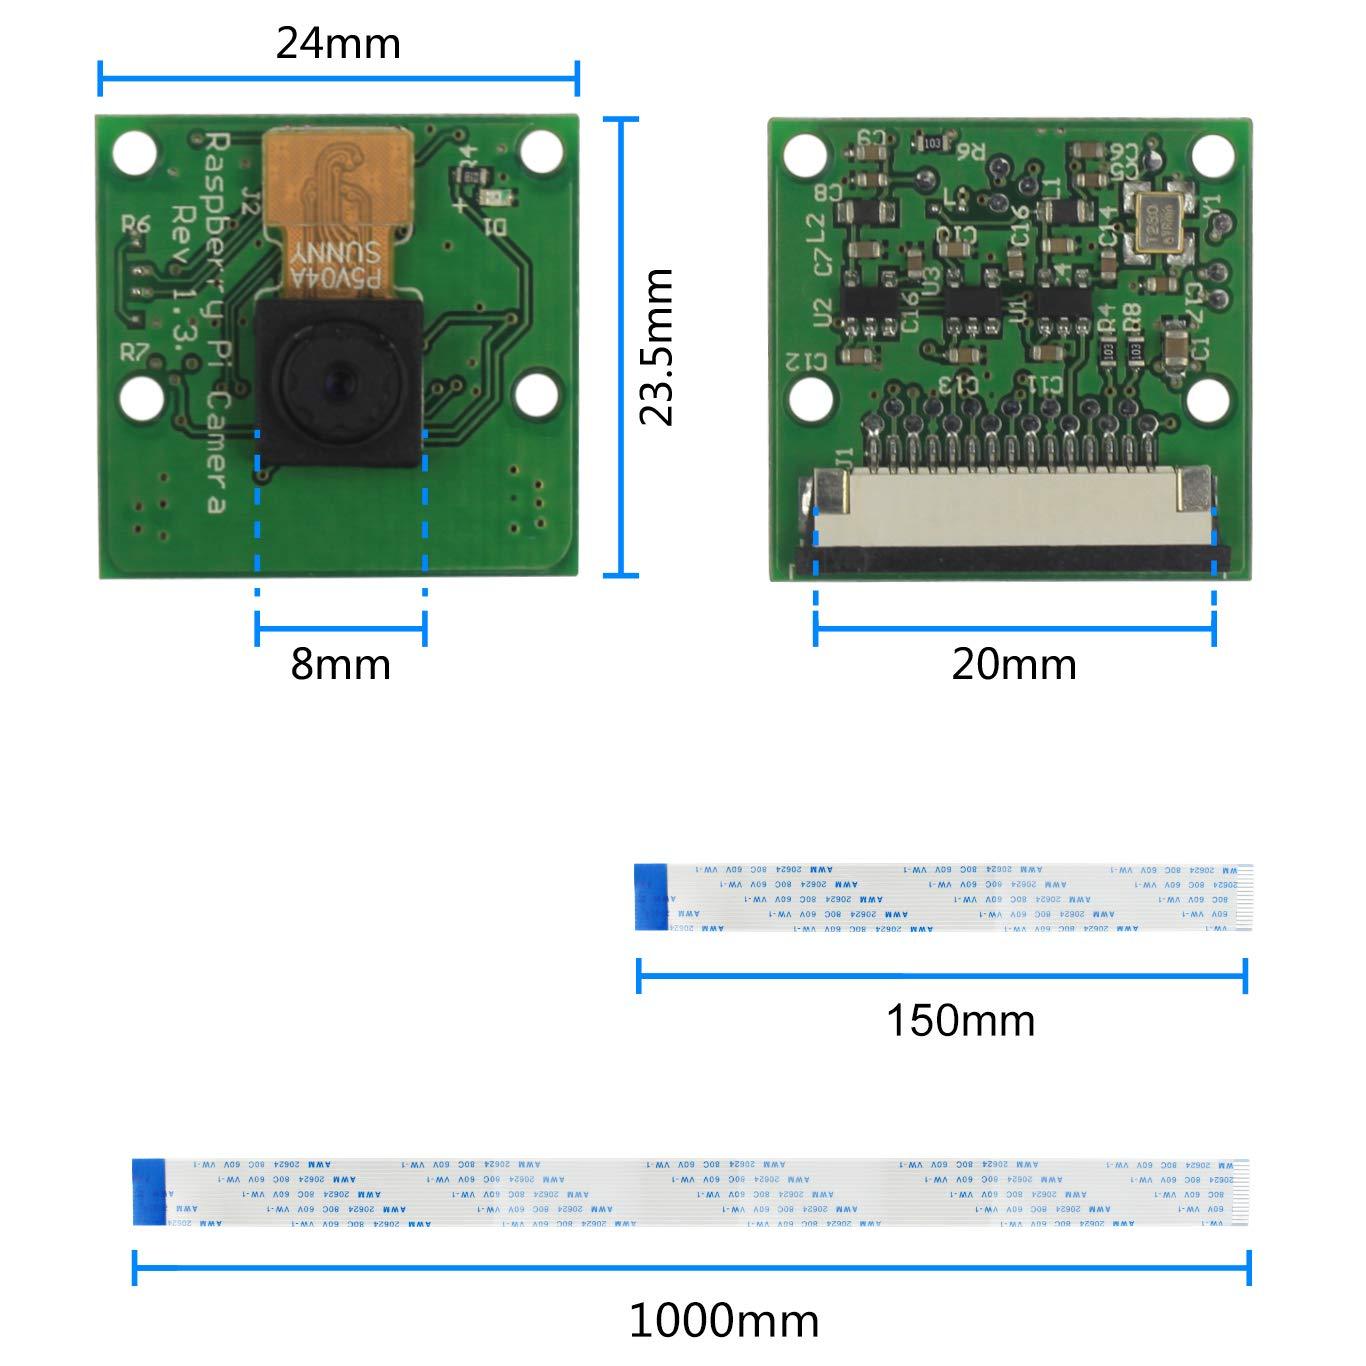 Jun_Electronic 5MP 1080P Video Camera Module for Raspberry Pi 3 b+, Pi Zero  W Camera with Case and Flex Cable (camera + holder)